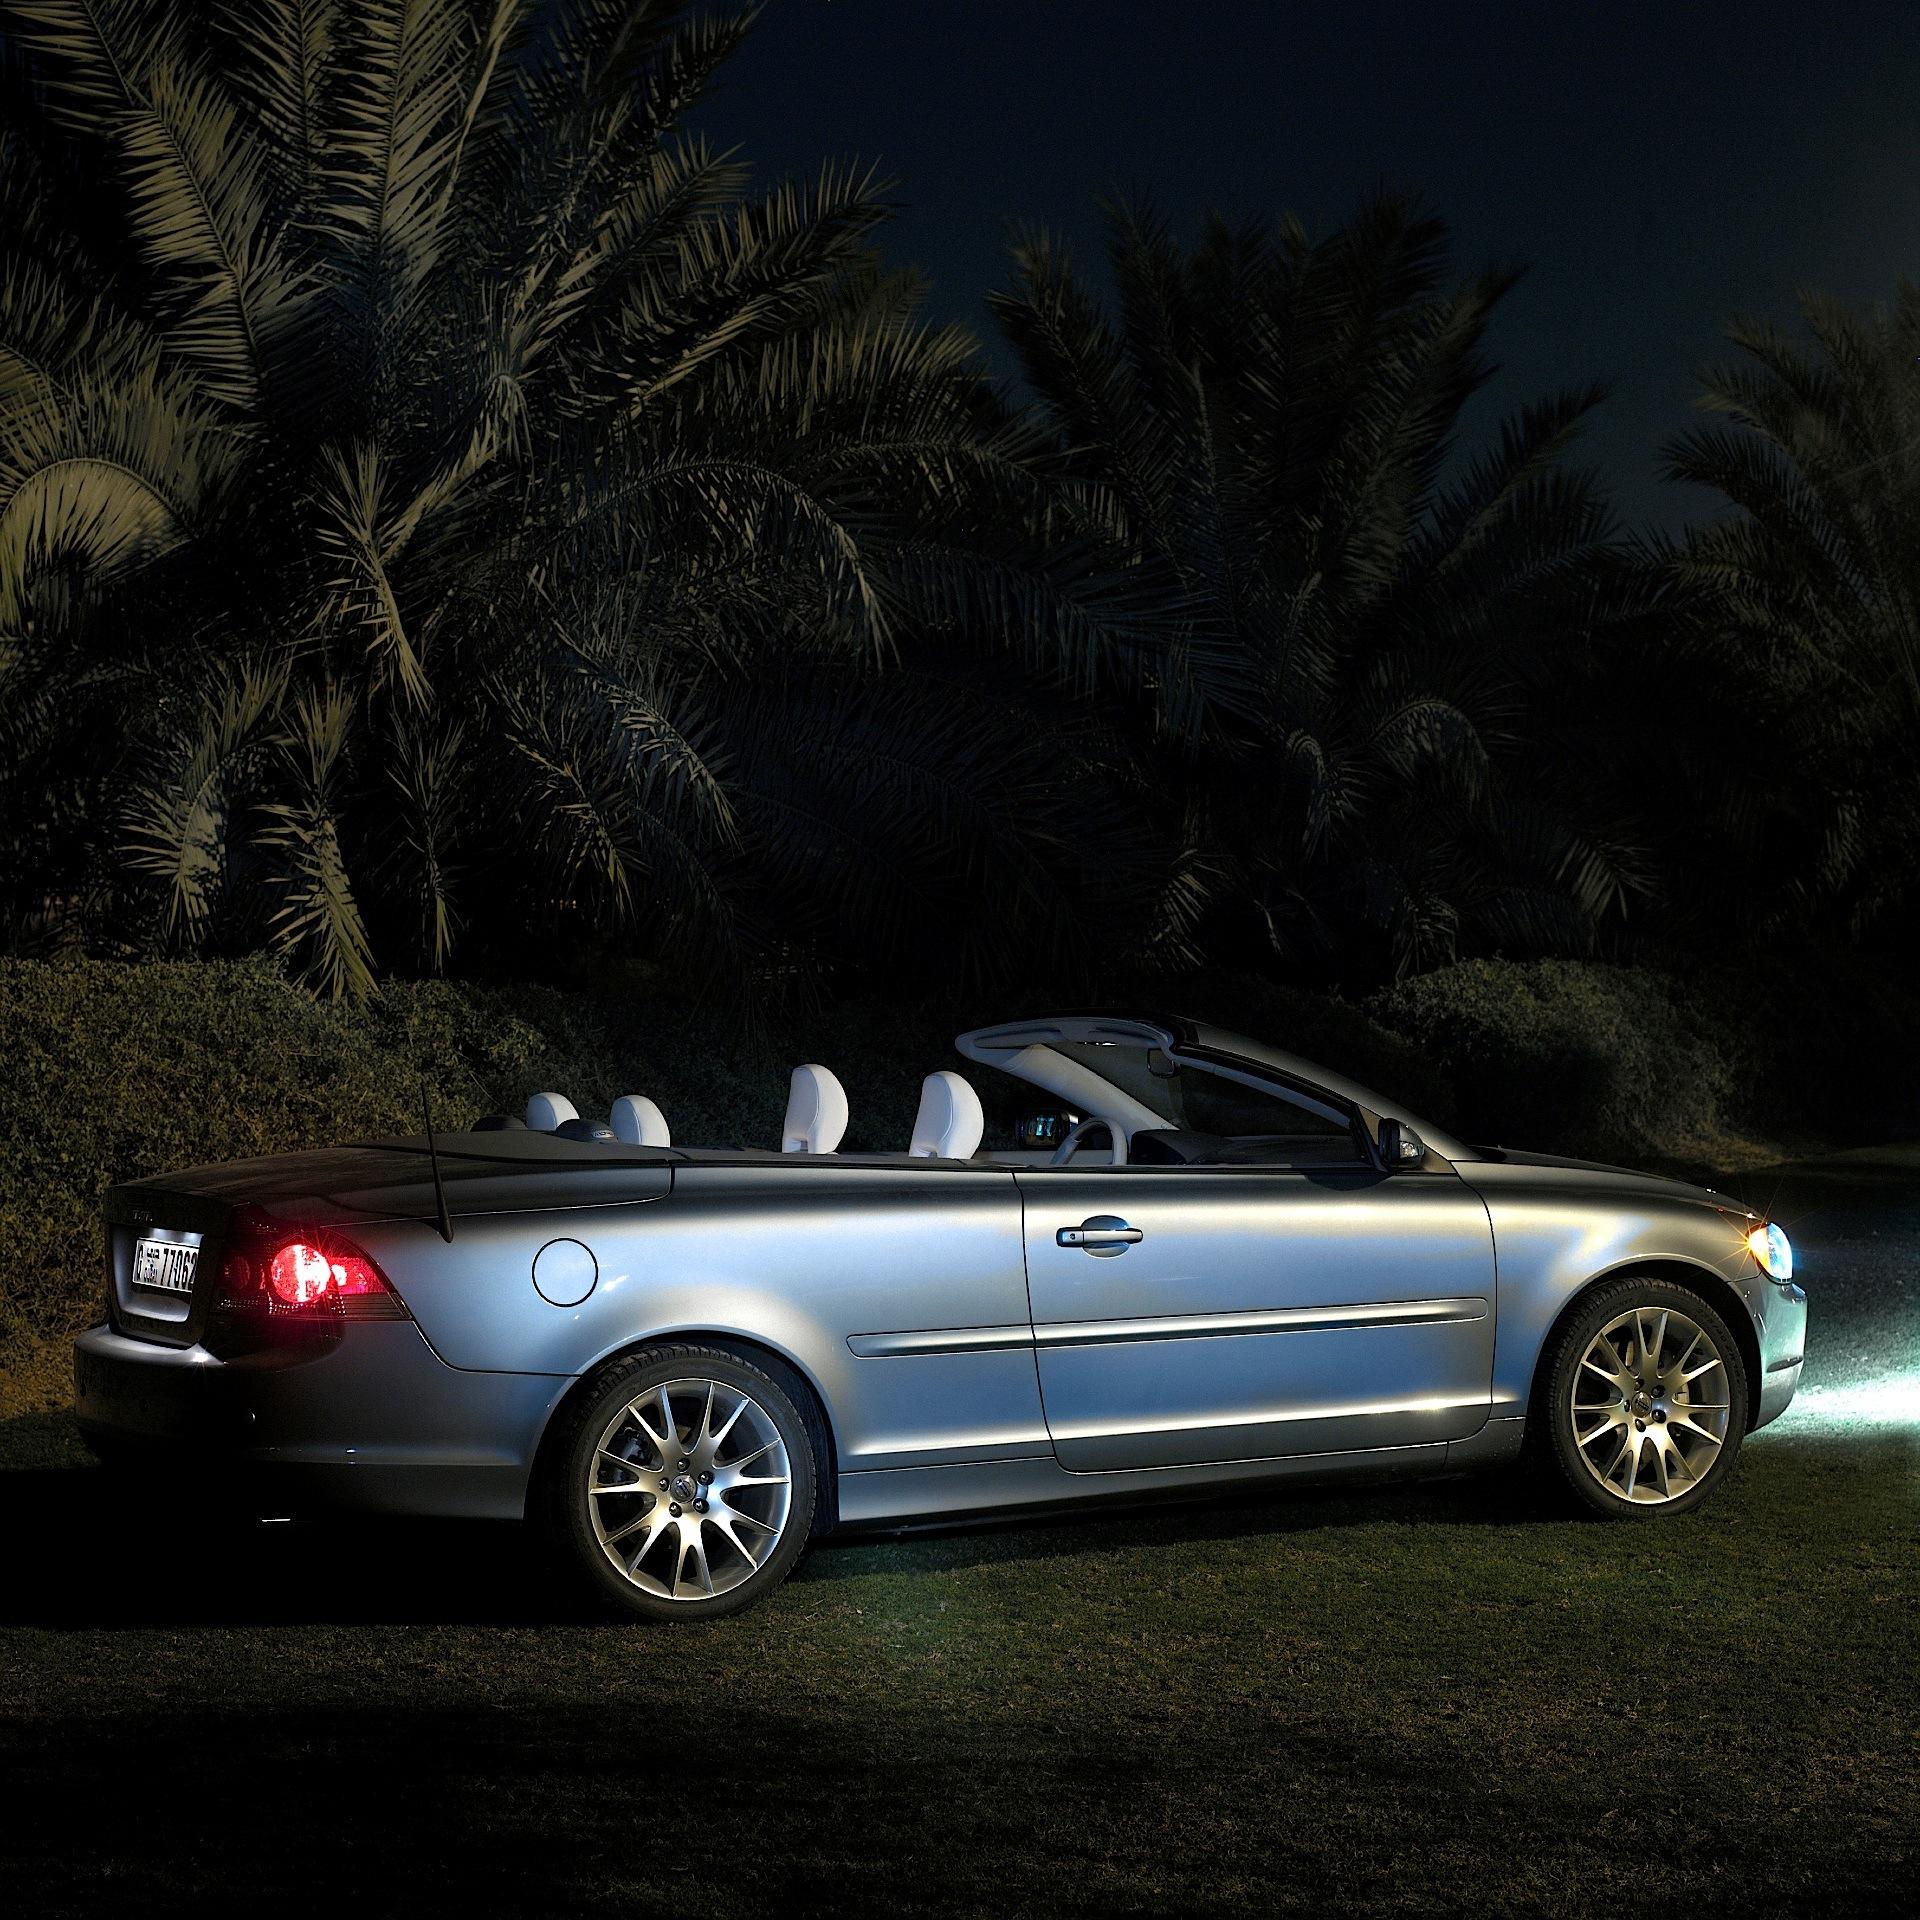 Used 2012 Volvo S60: 2005, 2006, 2007, 2008, 2009, 2010, 2011